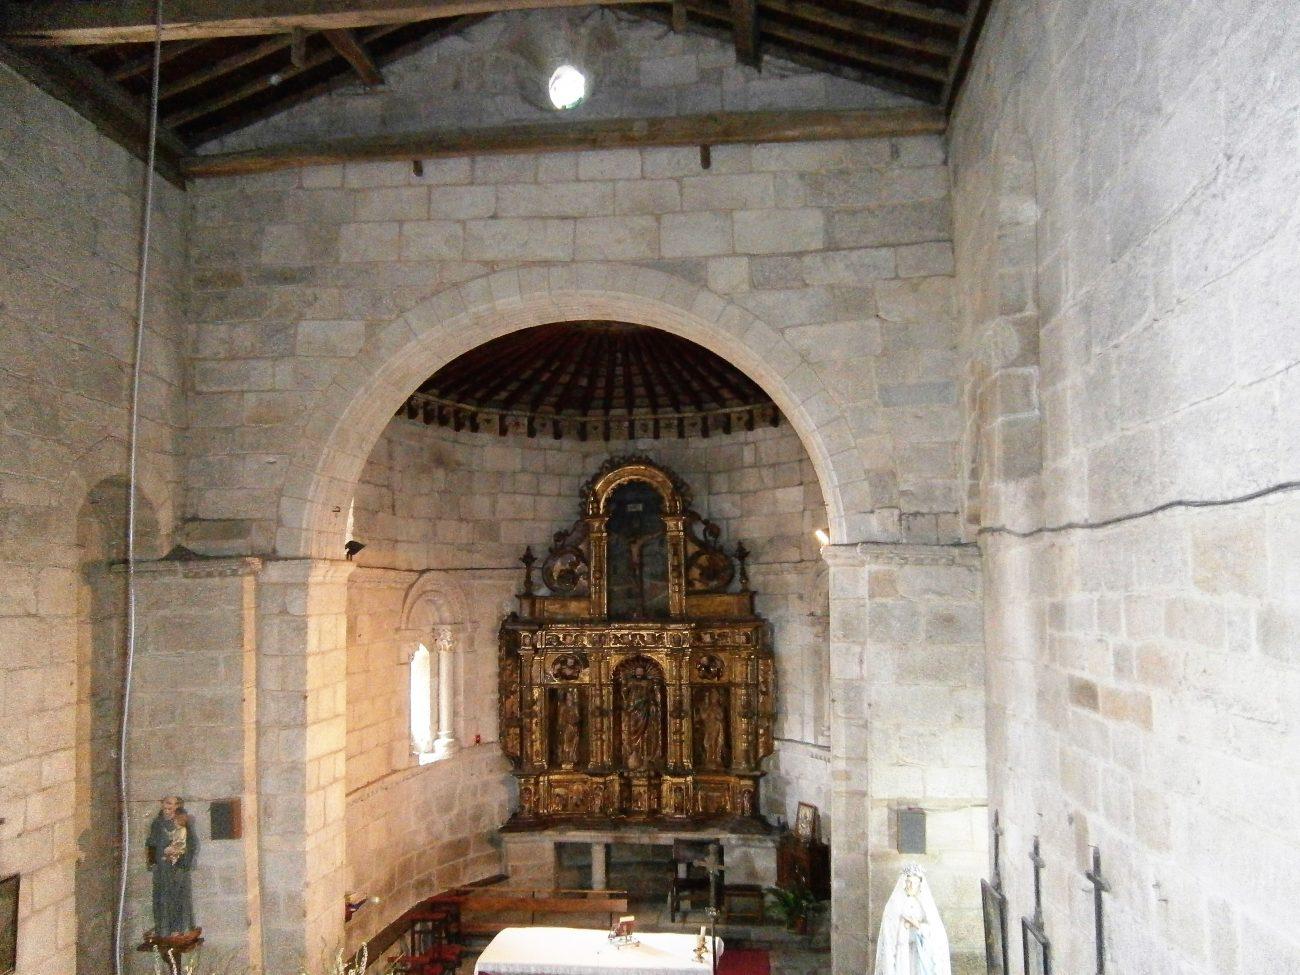 San Salvador de Asma (interior)